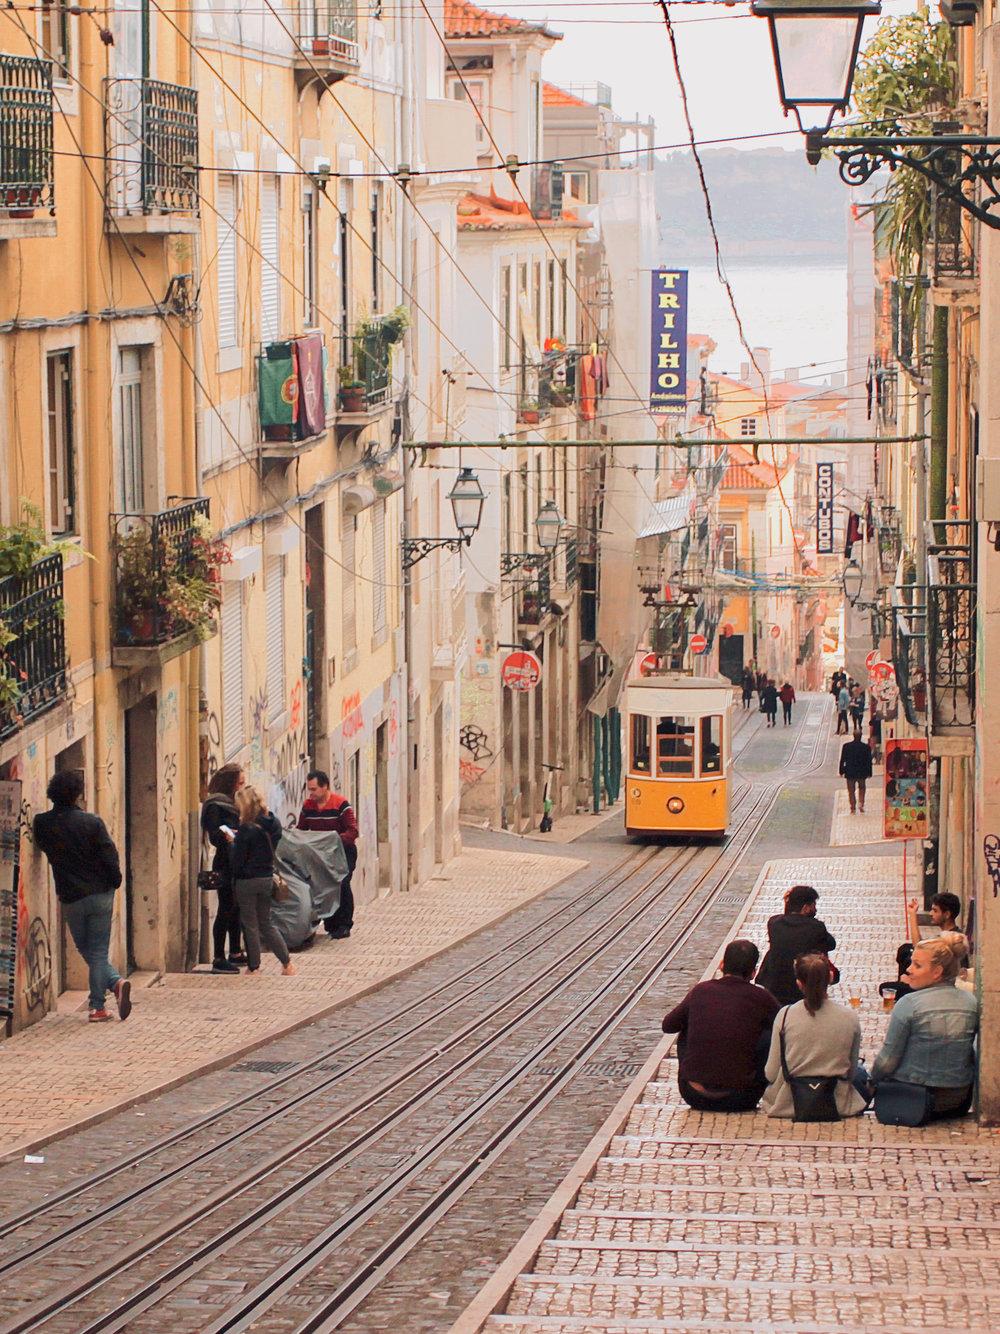 Unique experiences over 2 days in Lisbon | Bica Furnicular descending